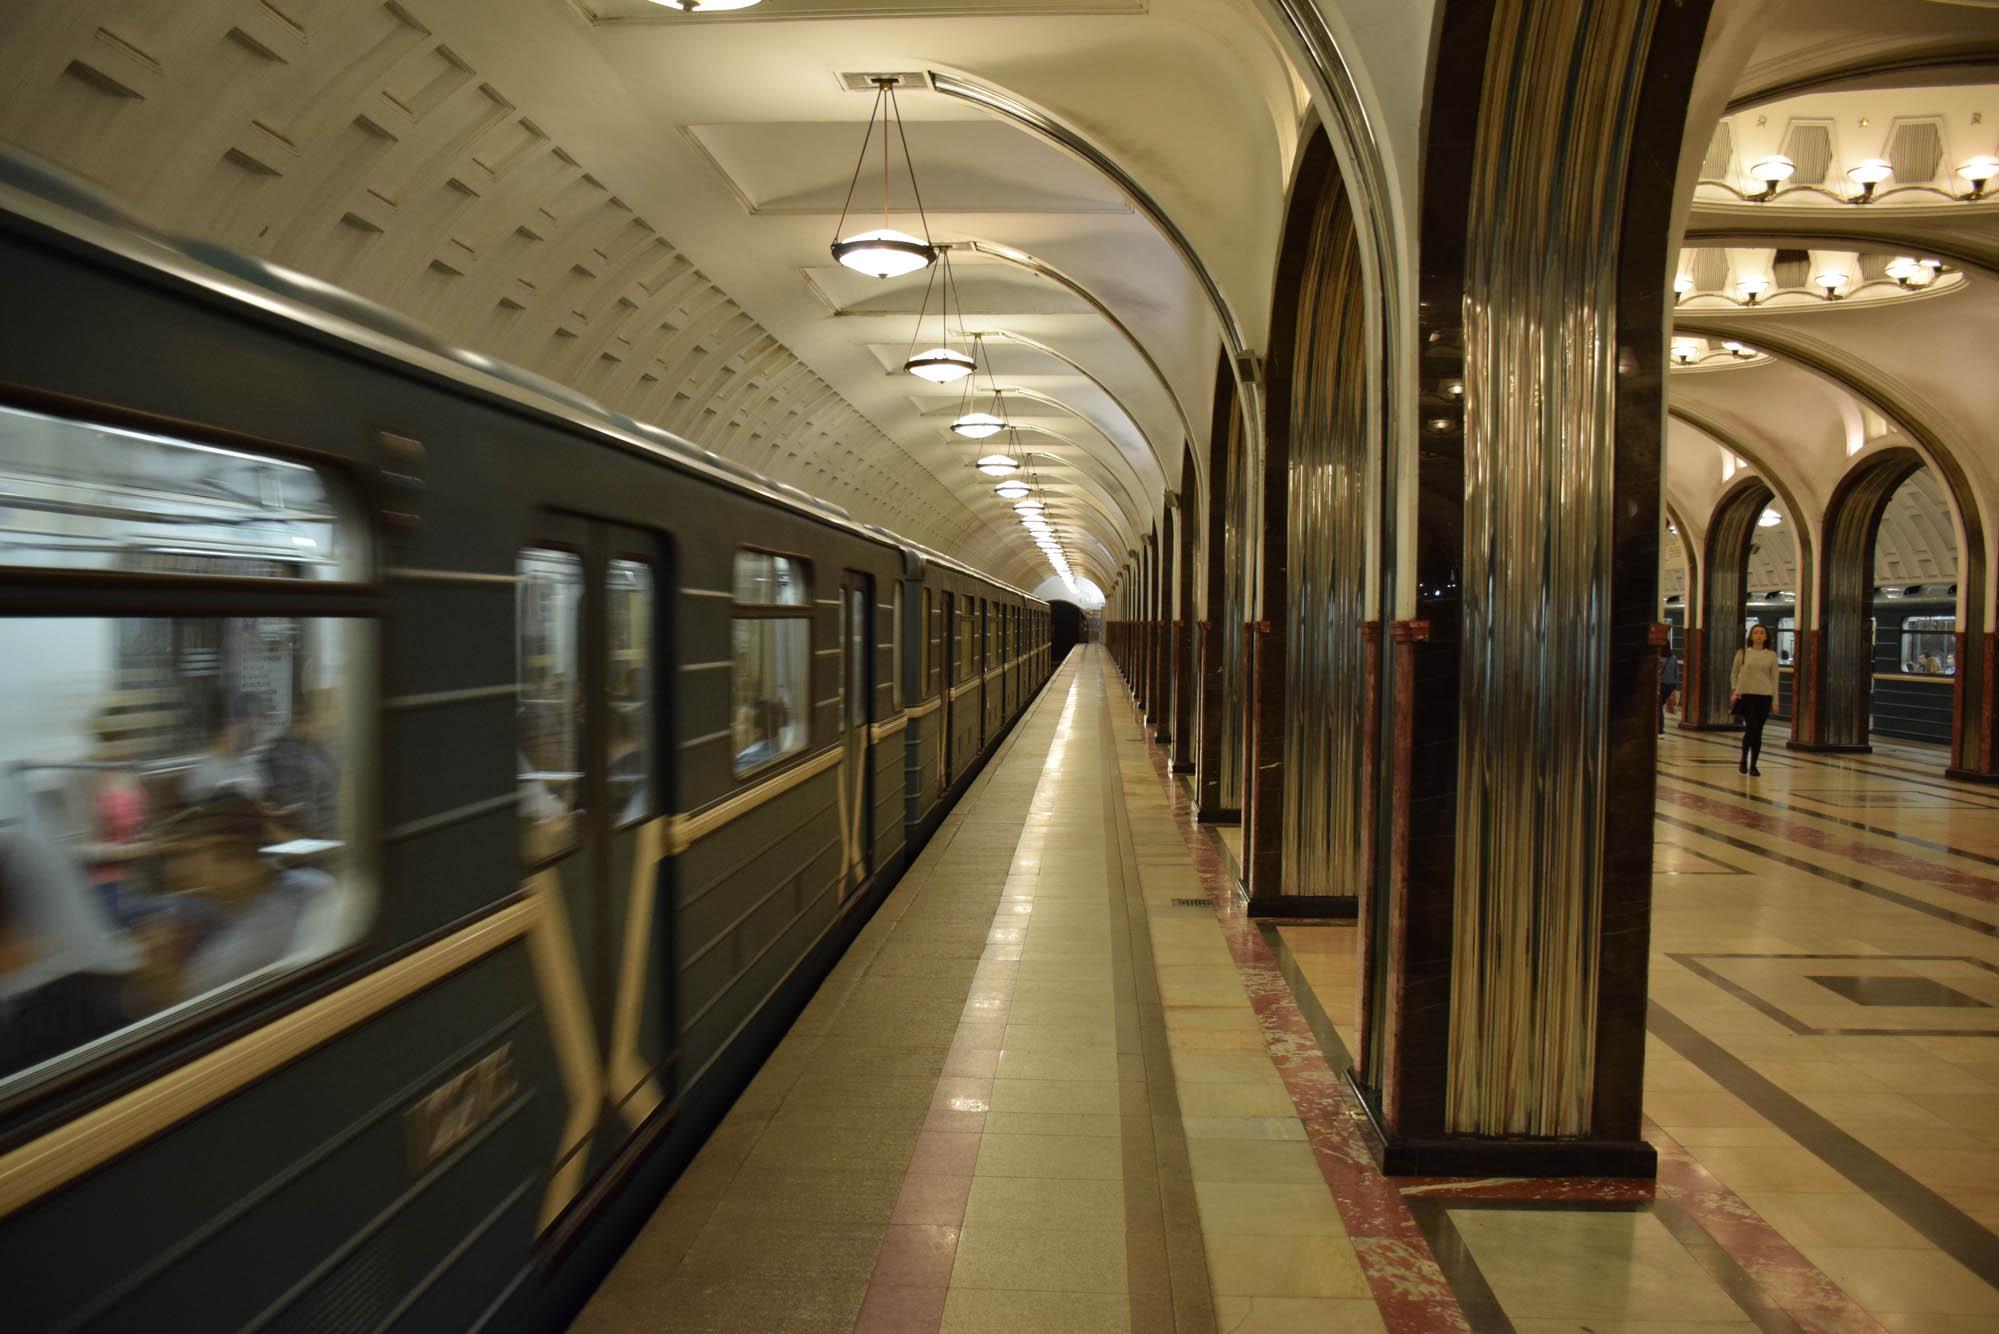 Estação de metrô Mayakovskaya - moscou